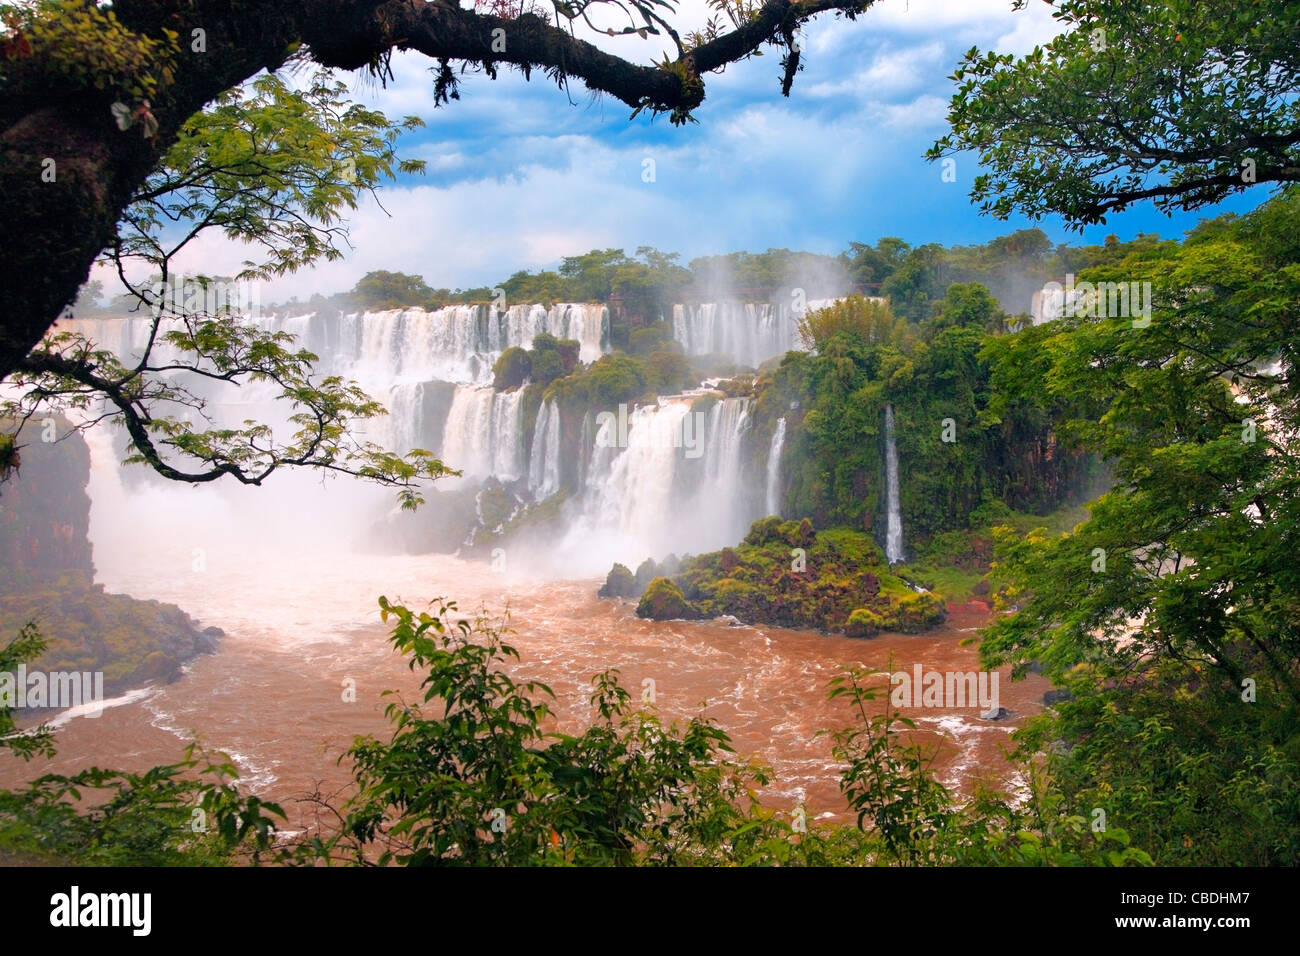 Iguazu falls, along Iguazu river. Placed in the border of Argentina, and Brasil. - Stock Image